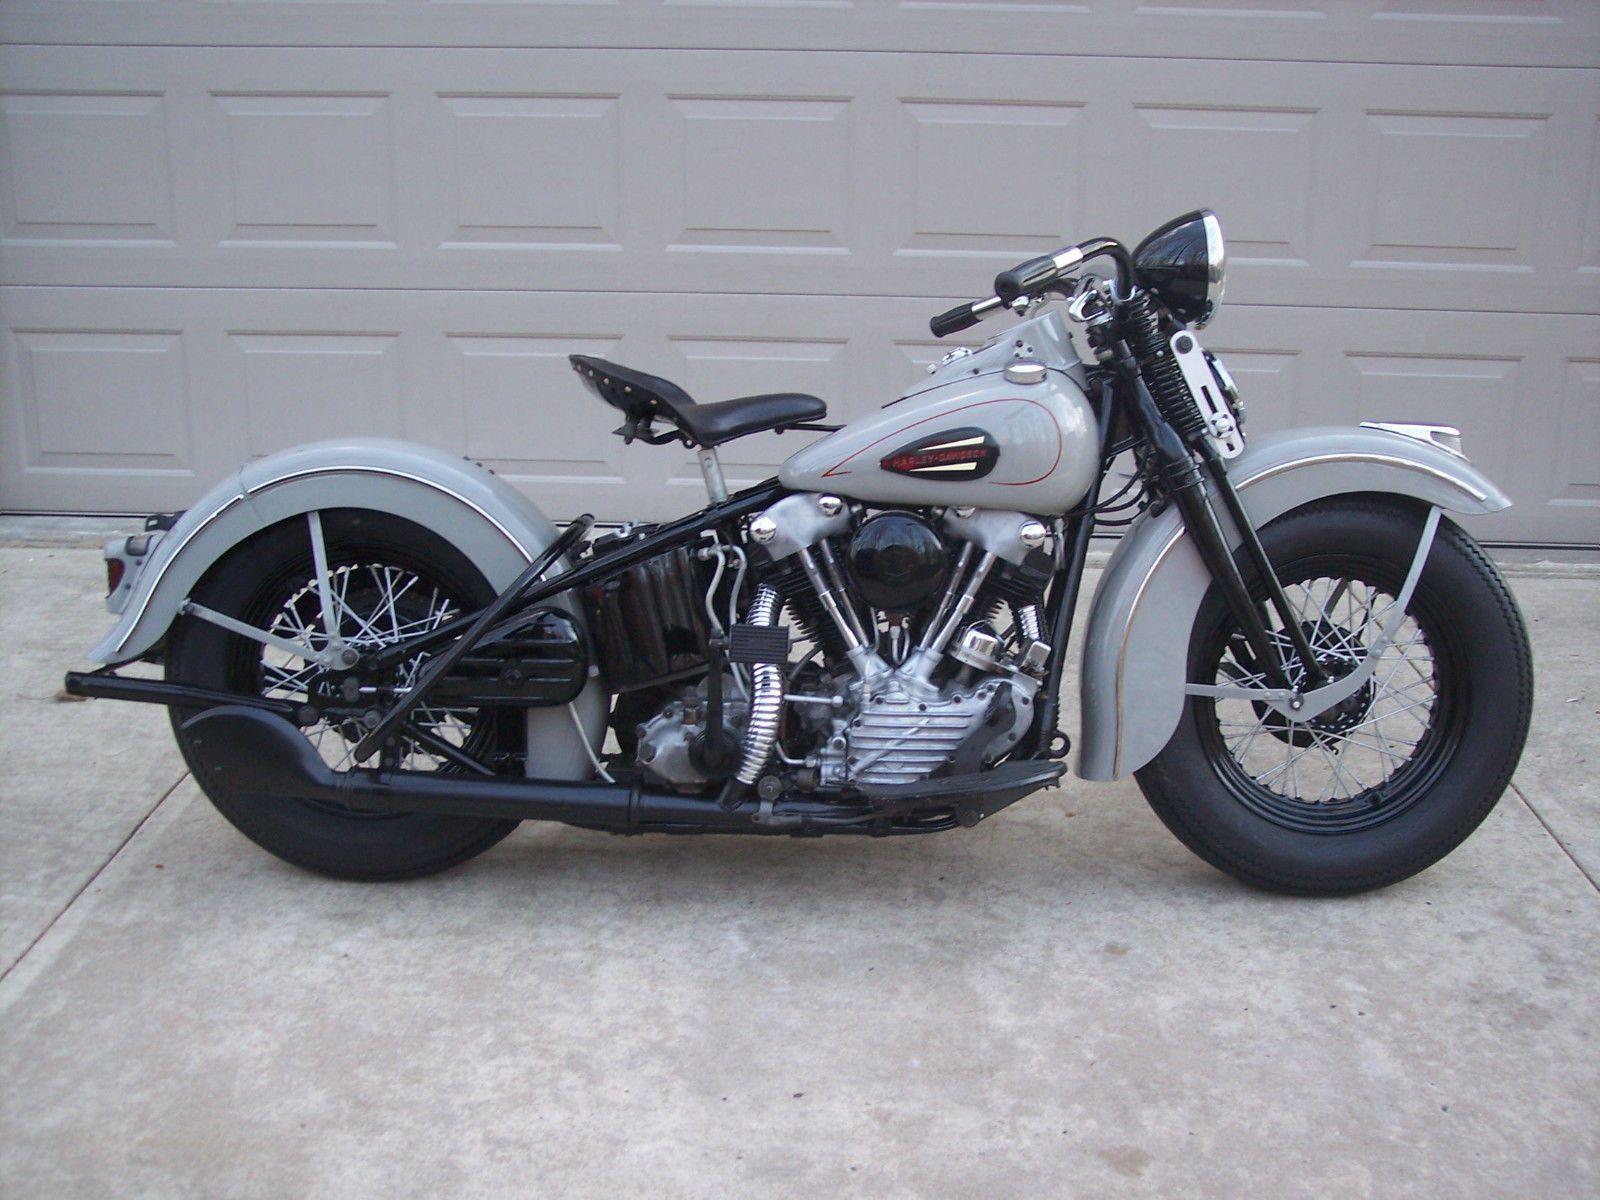 #Forsale 1940 Harley Davidson Knucklehead - Price @$33,400.00